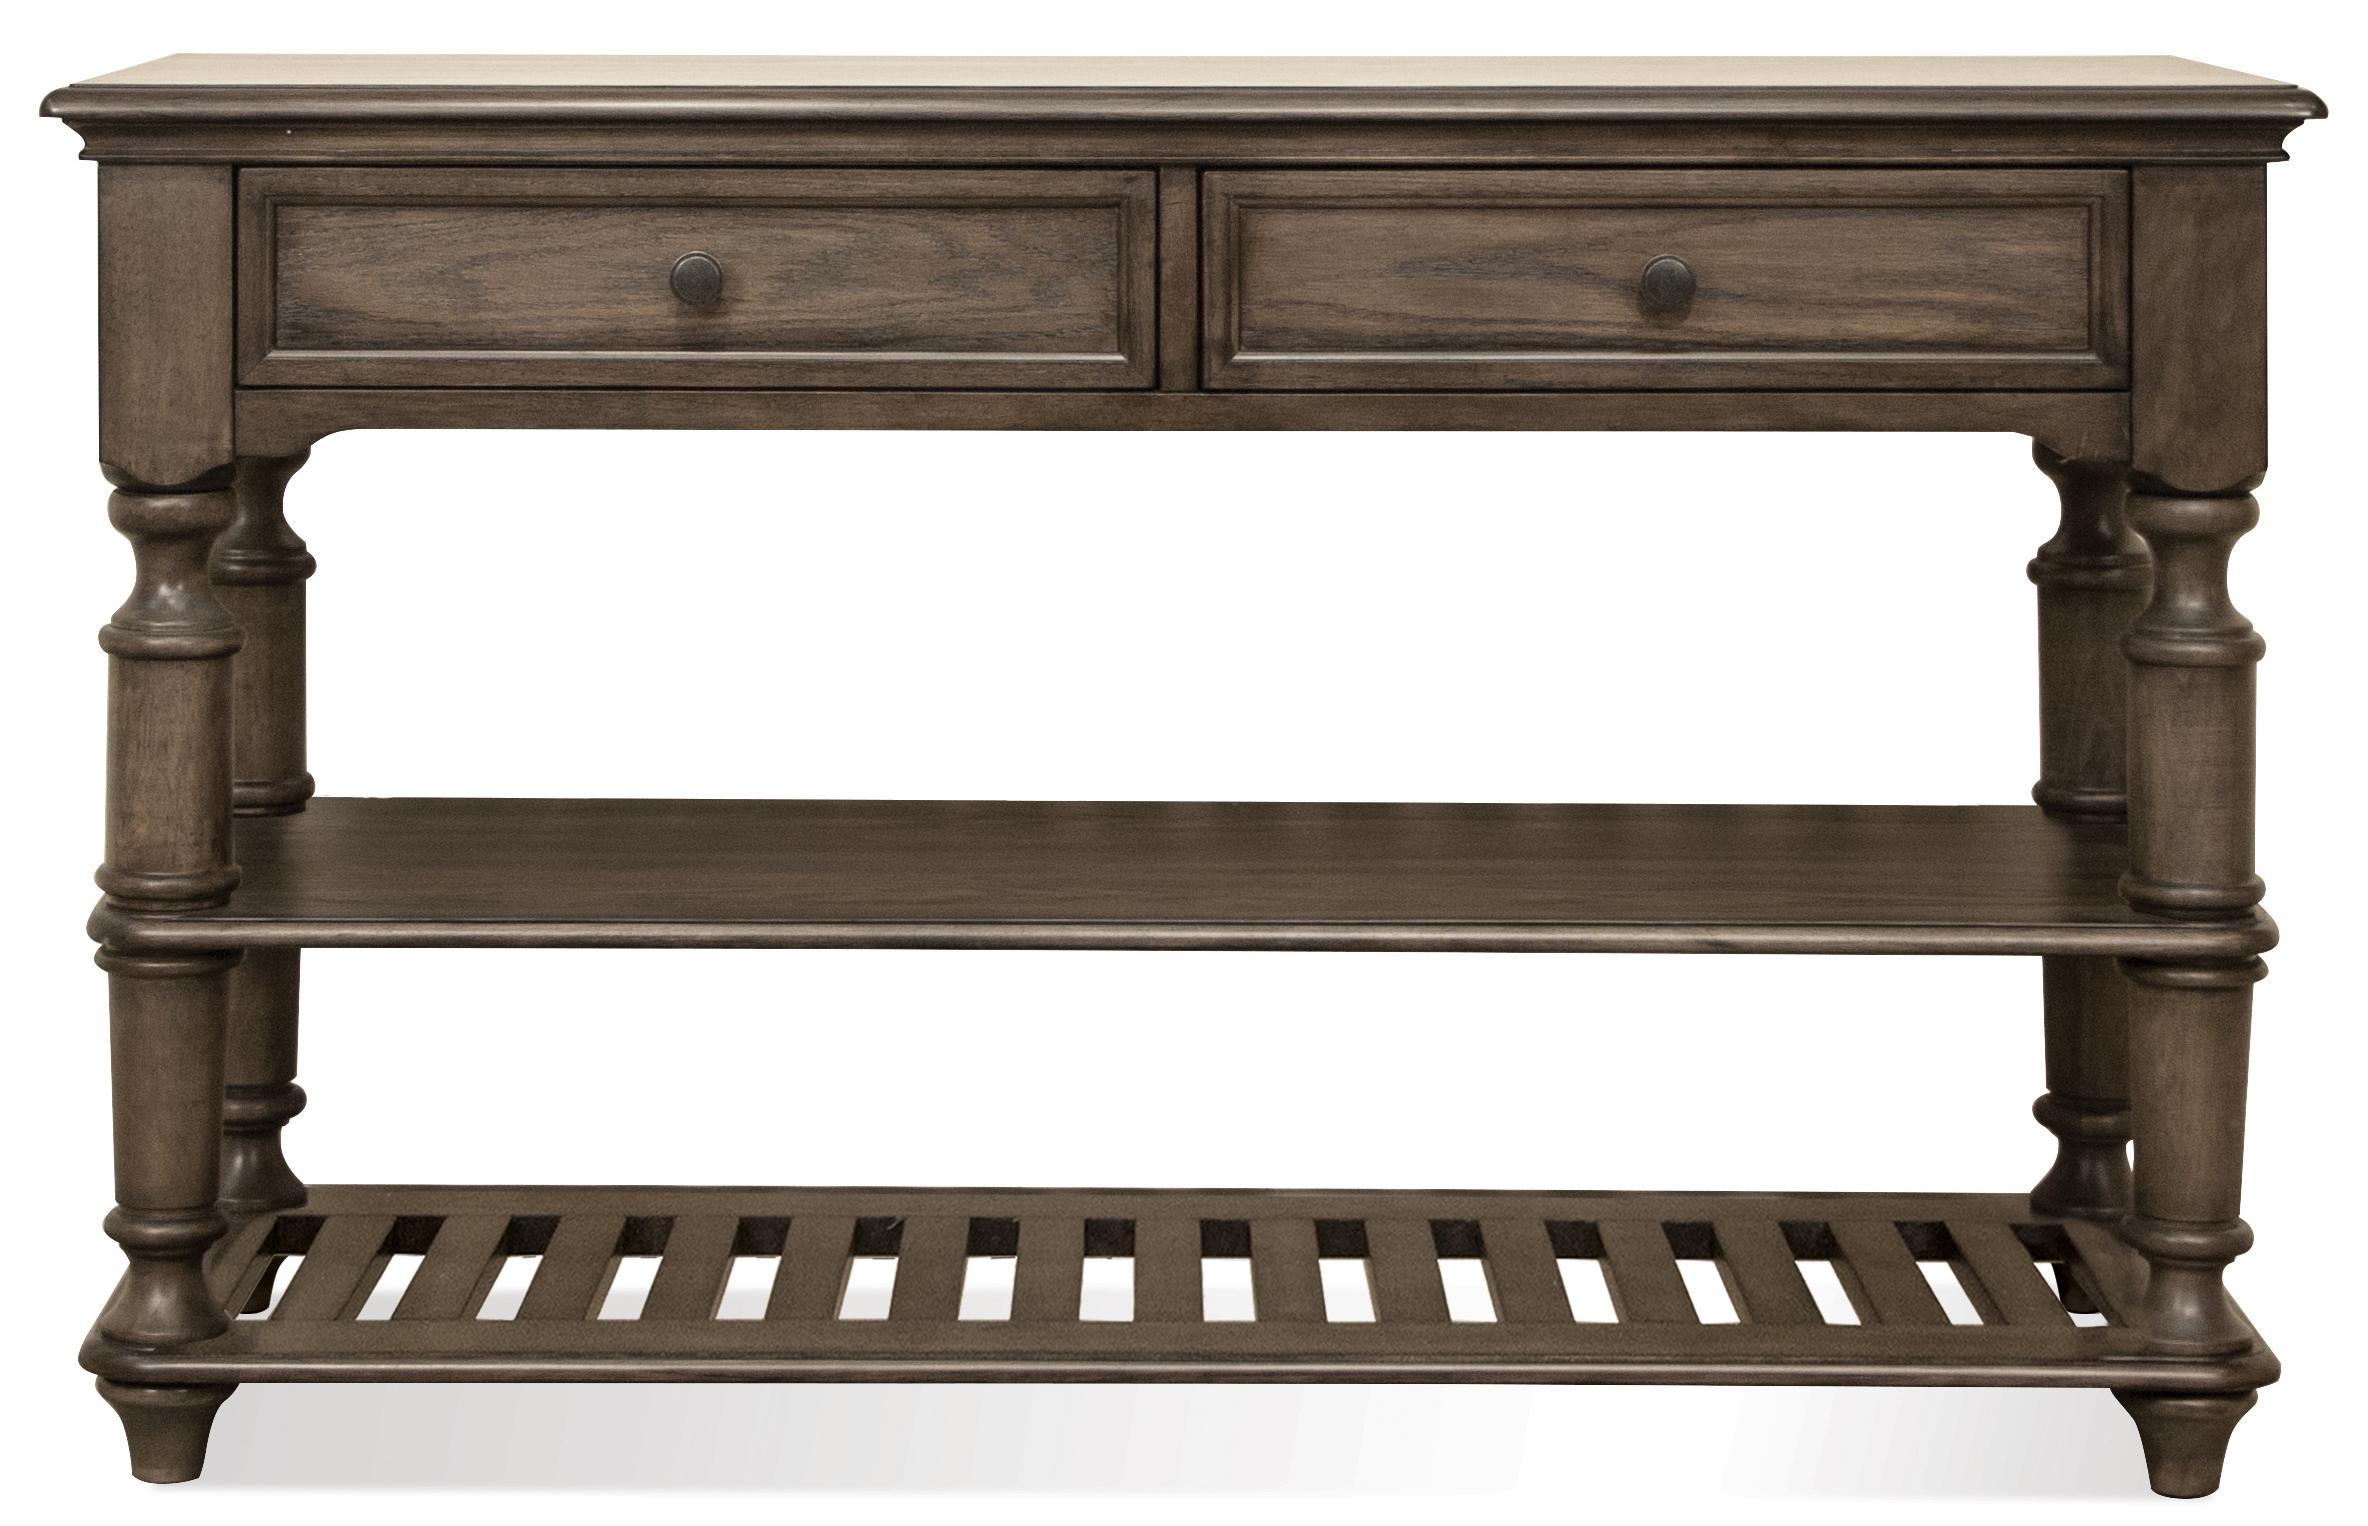 Riverside Furniture Belmeade Console Table - Item Number: 15815